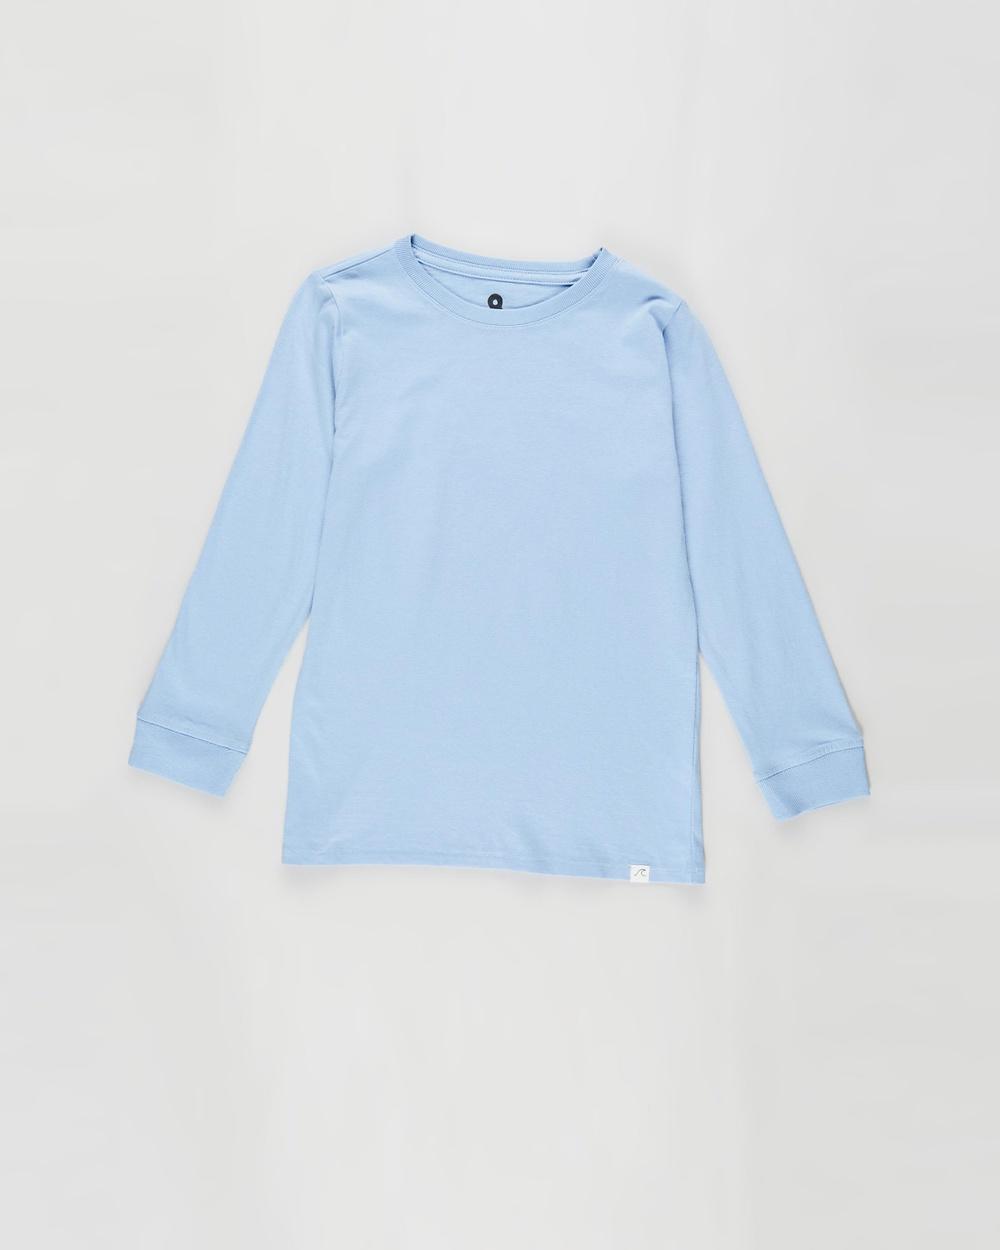 Cotton On Kids - Core Long Sleeve Tee   Kids - T-Shirts & Singlets (Dusk Blue) Core Long Sleeve Tee - Kids